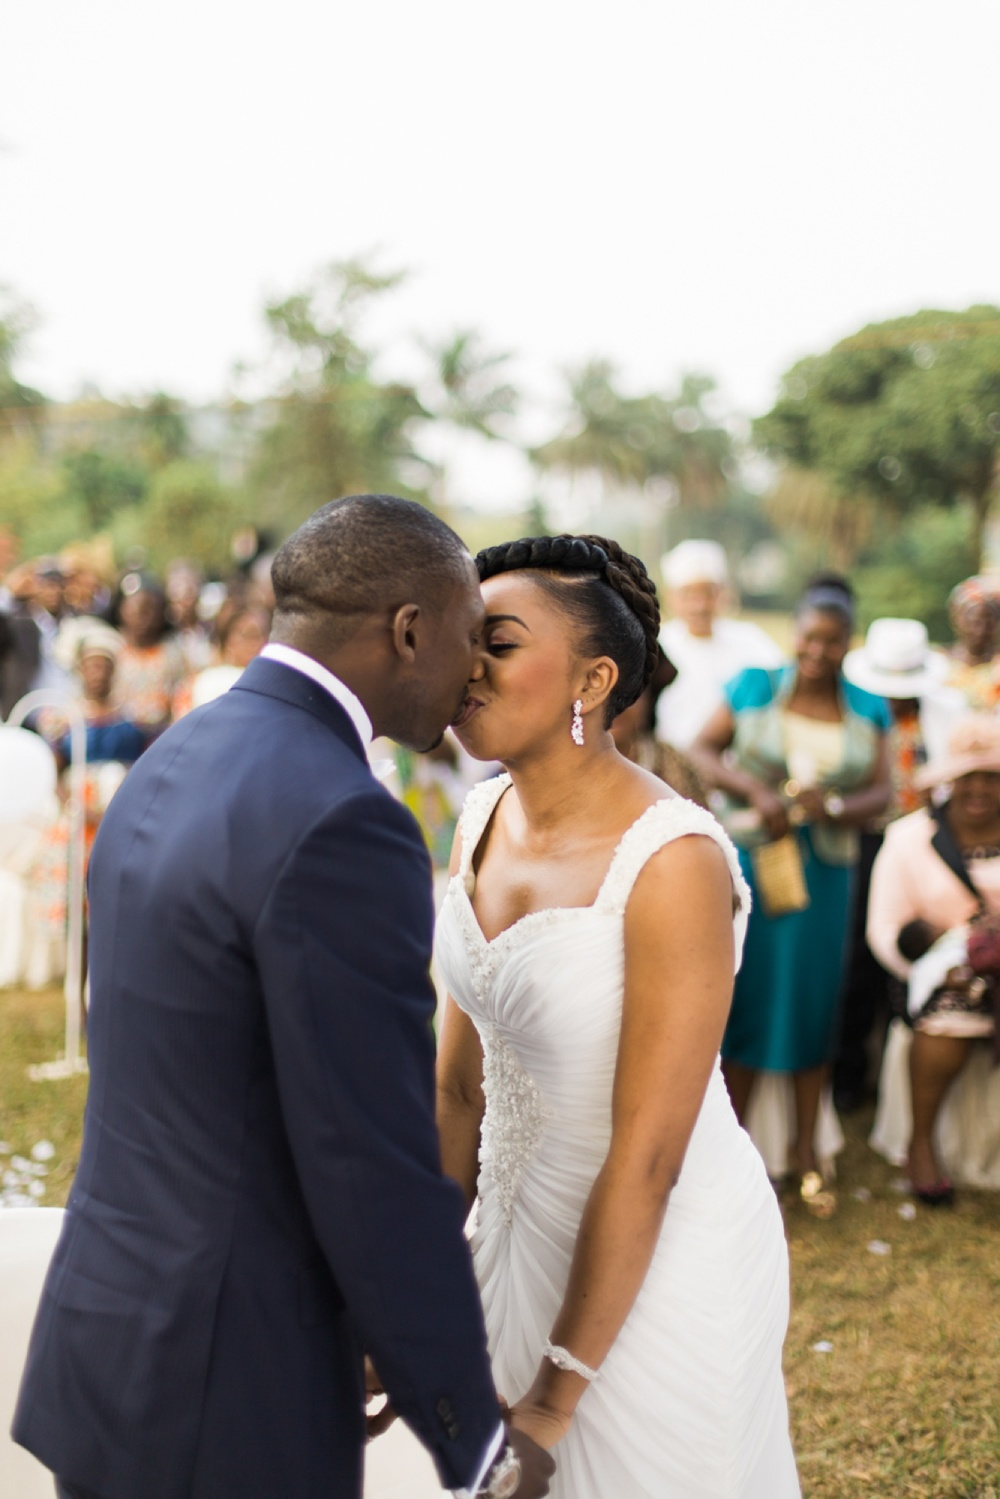 photographe-mariage-paris-alain-m_0208.jpg